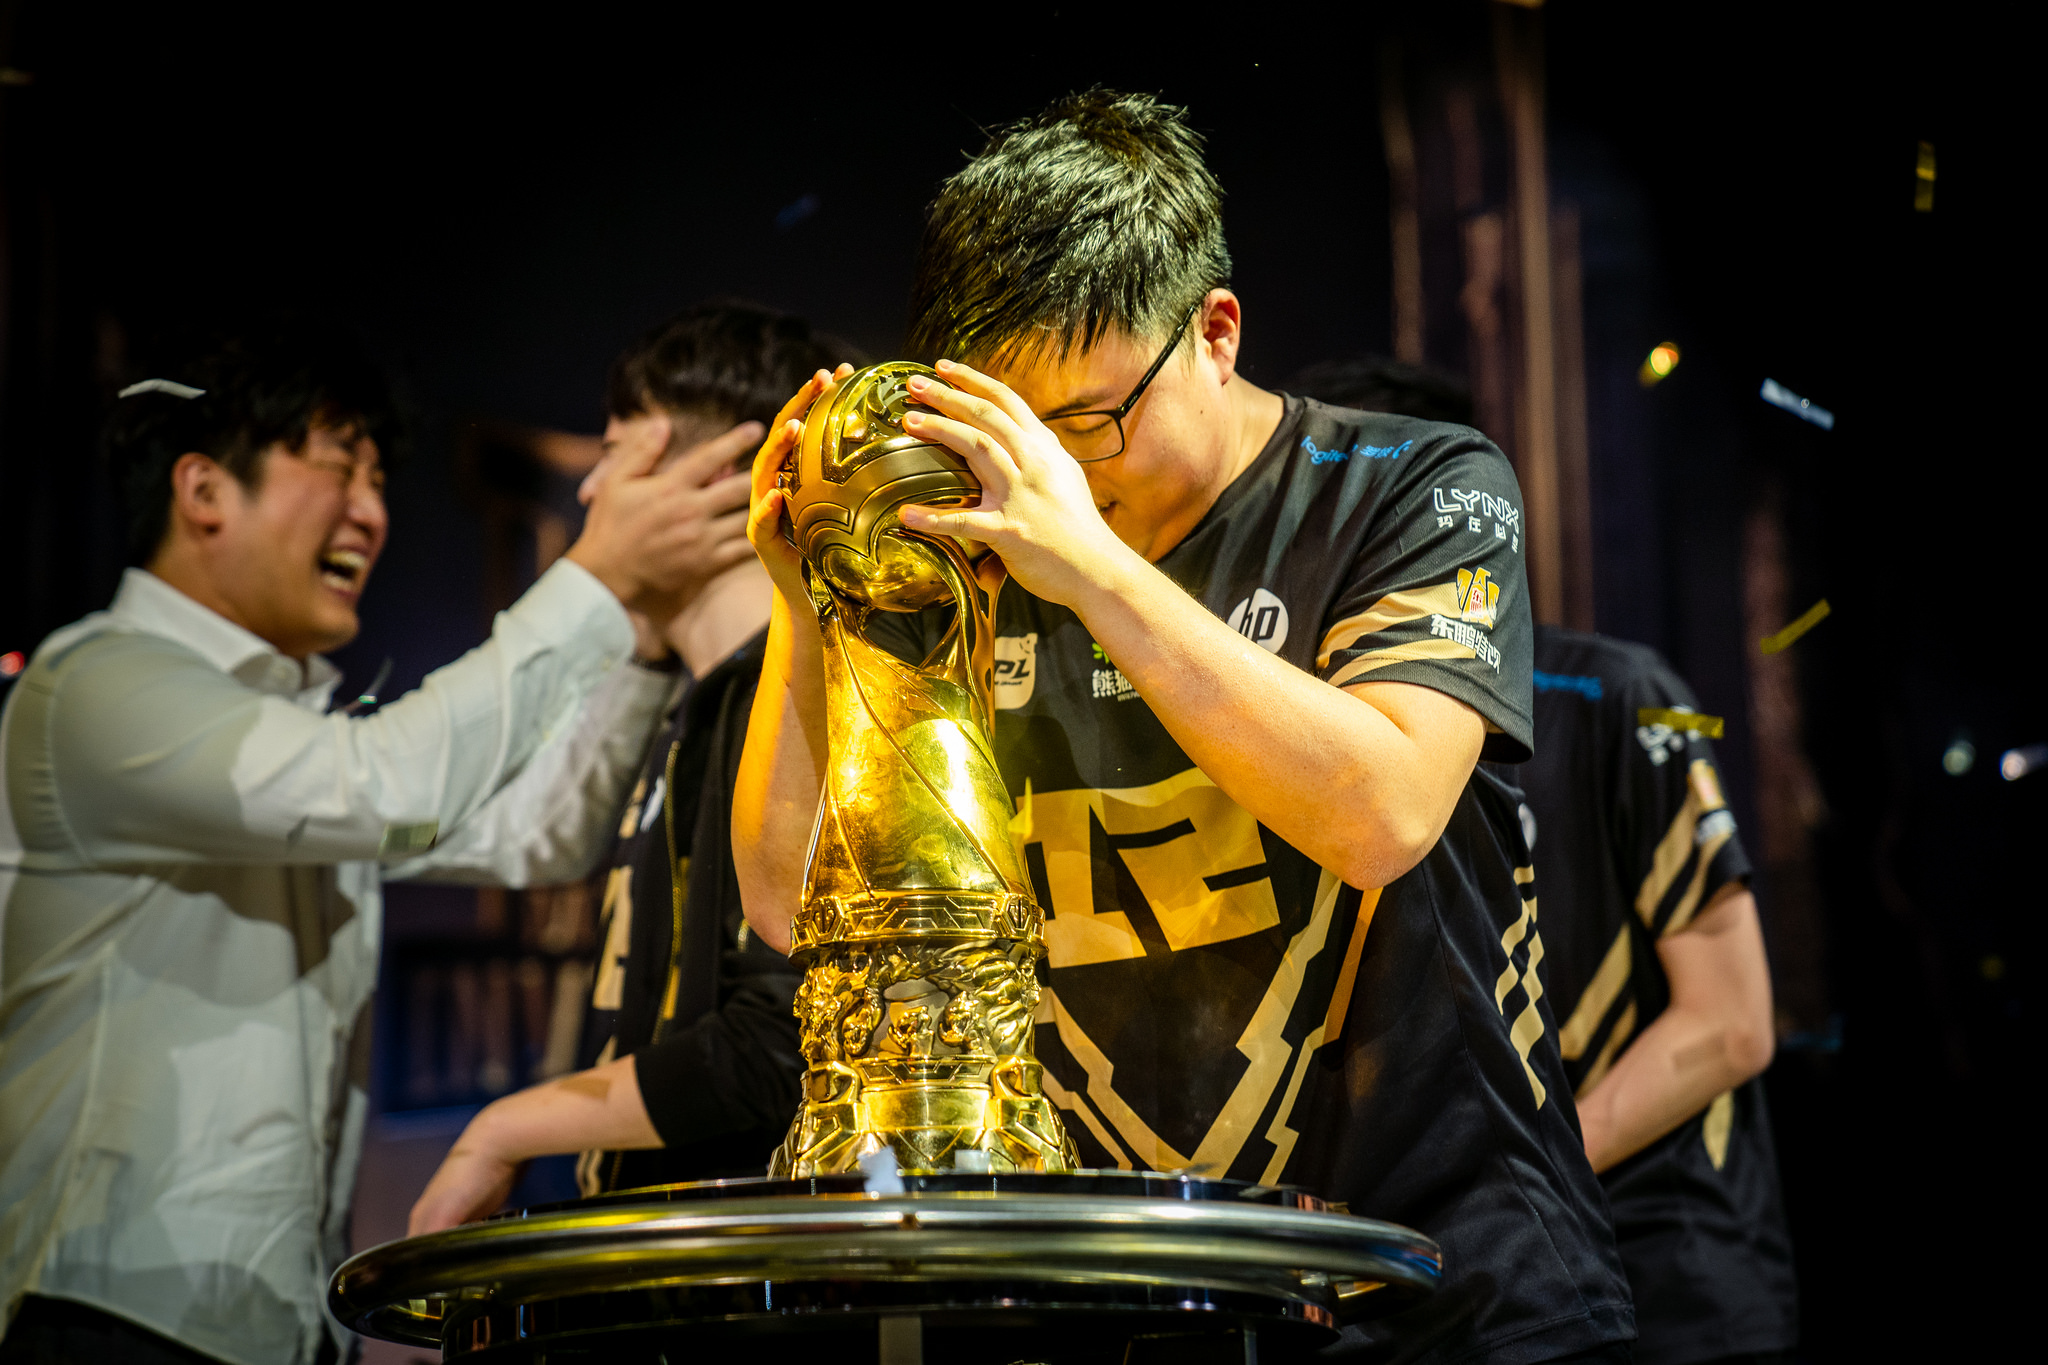 MSI League of Legends 2018 - Uzi Champion